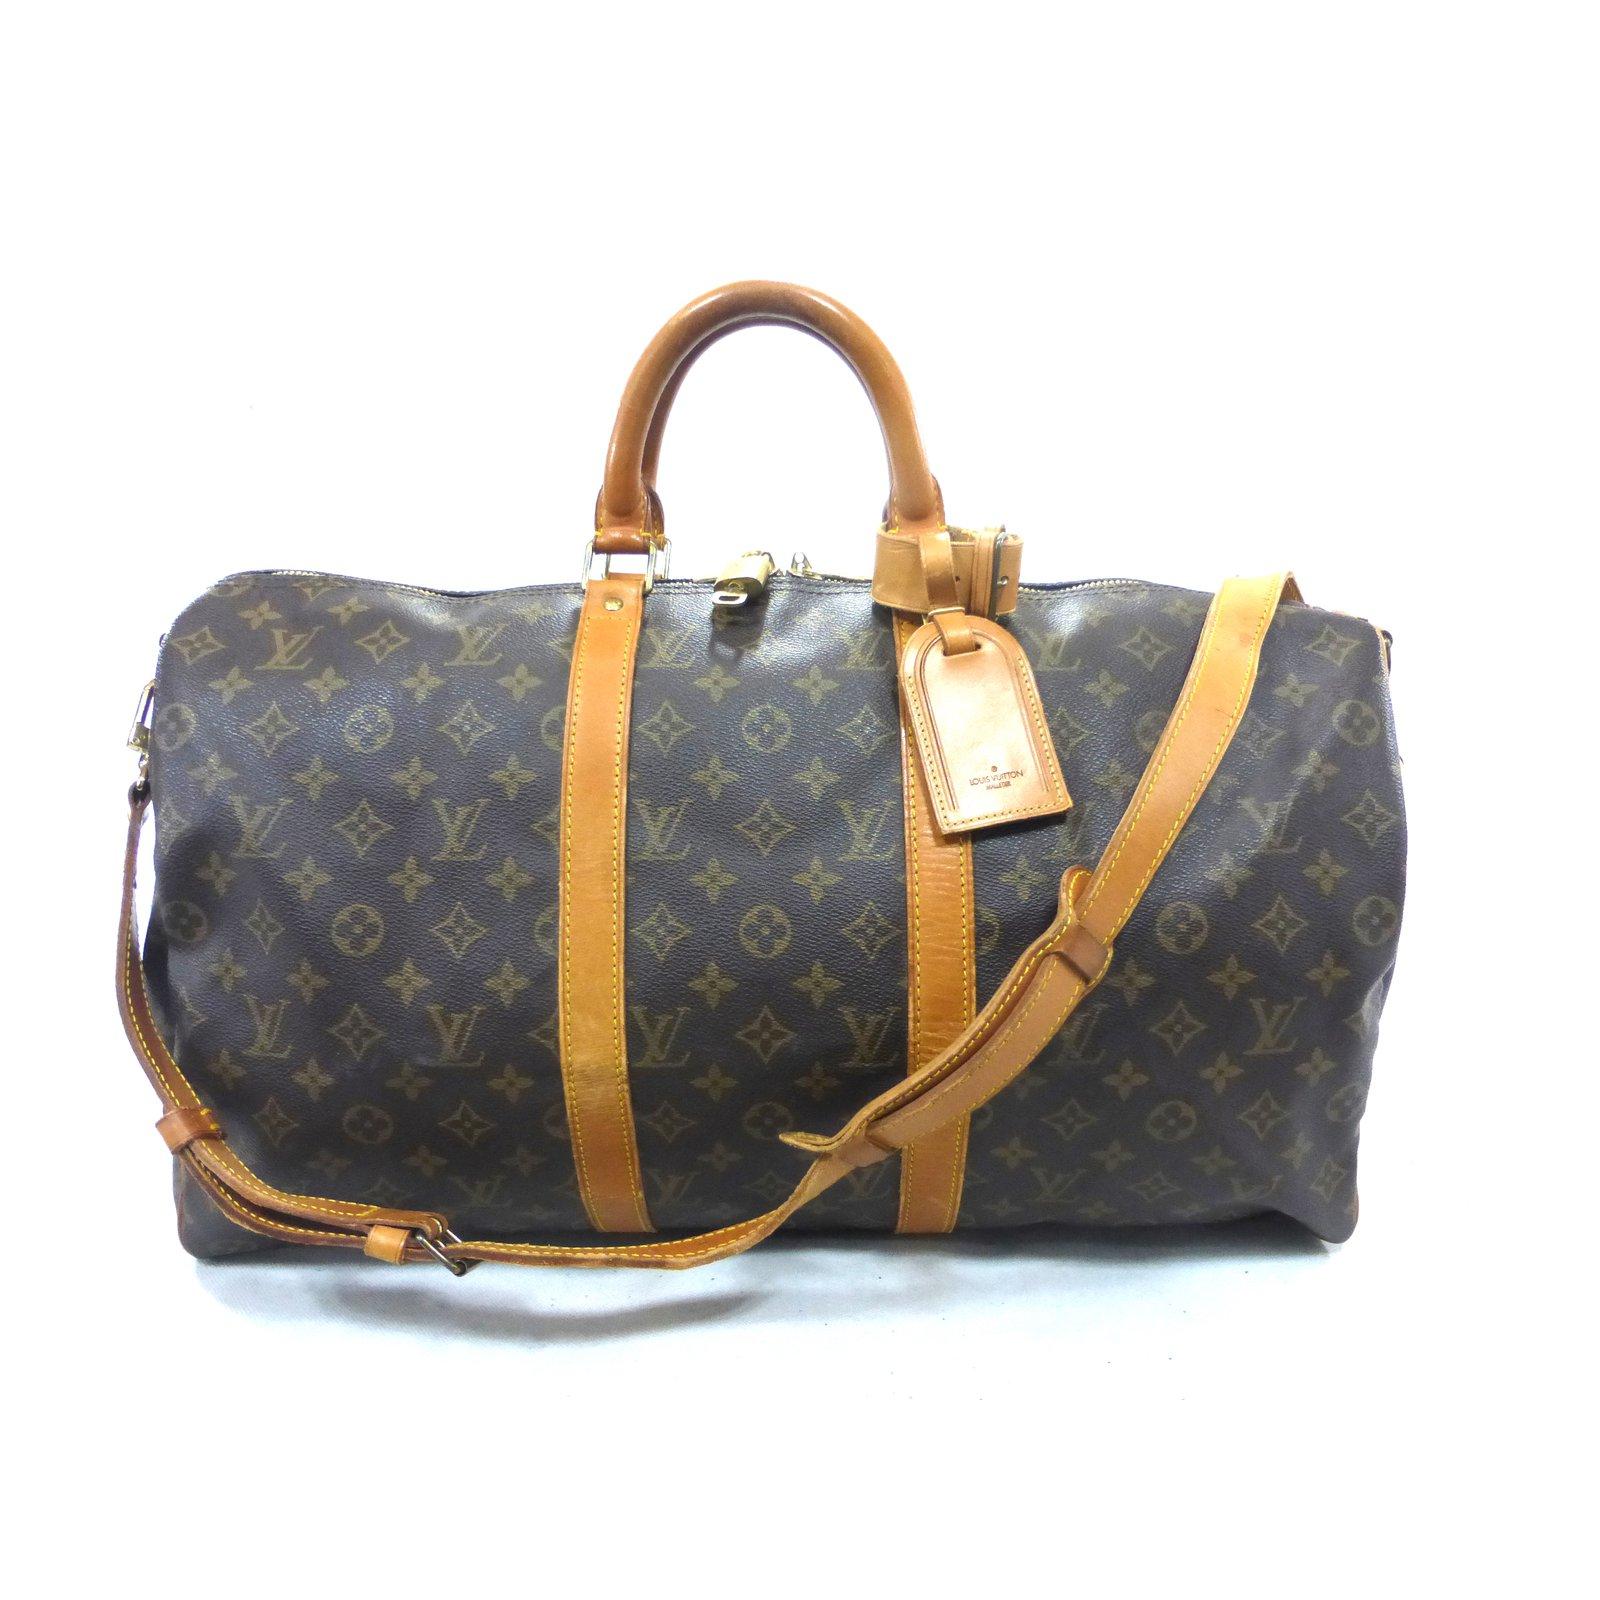 Sacs de voyage Louis Vuitton KEEPALL 50 BANDOULIERE MONOGRAM Cuir Marron  ref.99323 632fa3b6cc0